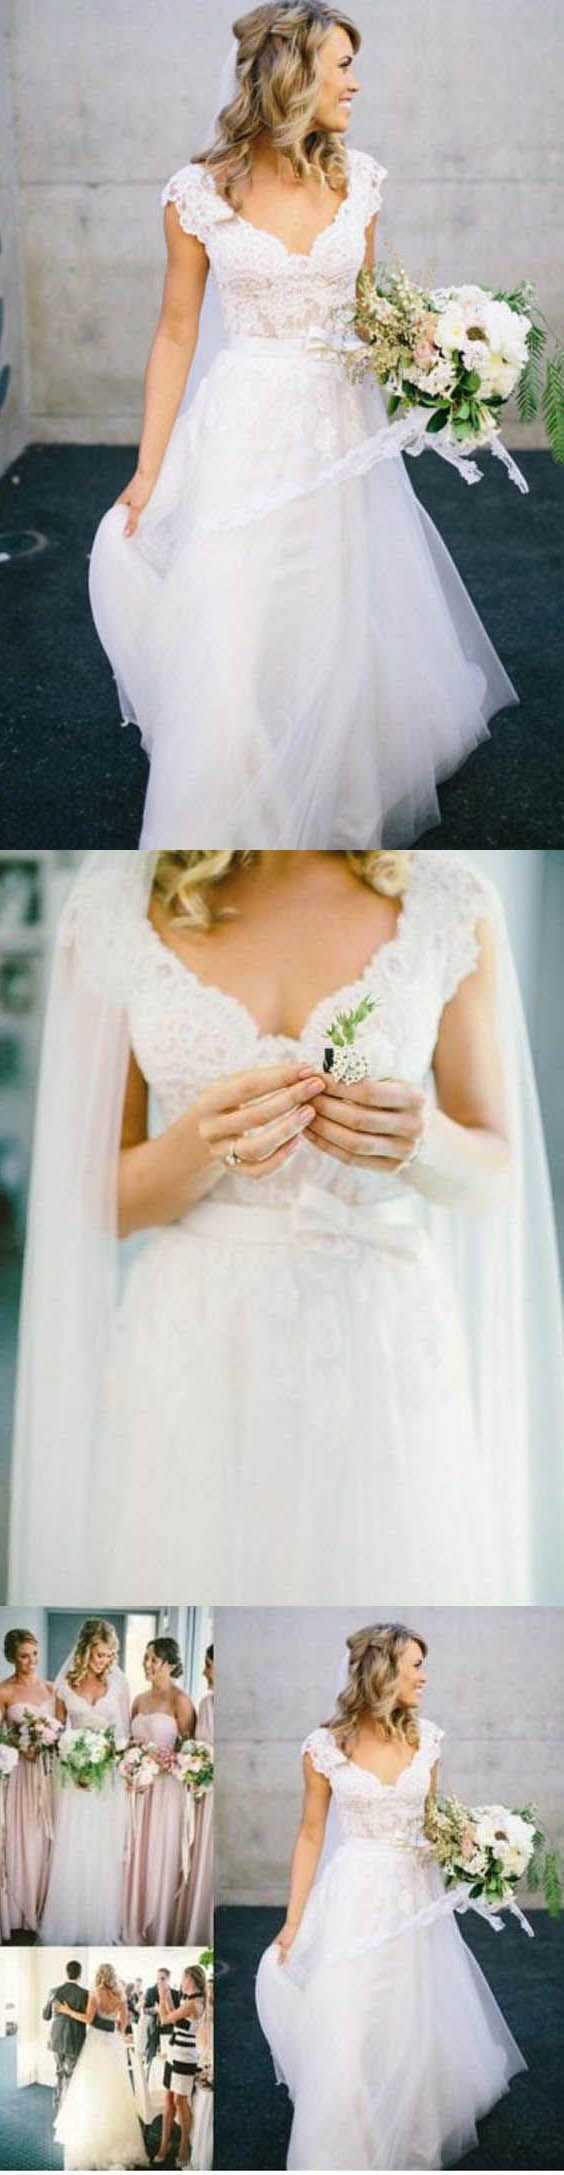 Ronald joyce lace wedding dress september 2018  best Wedding dress images on Pinterest